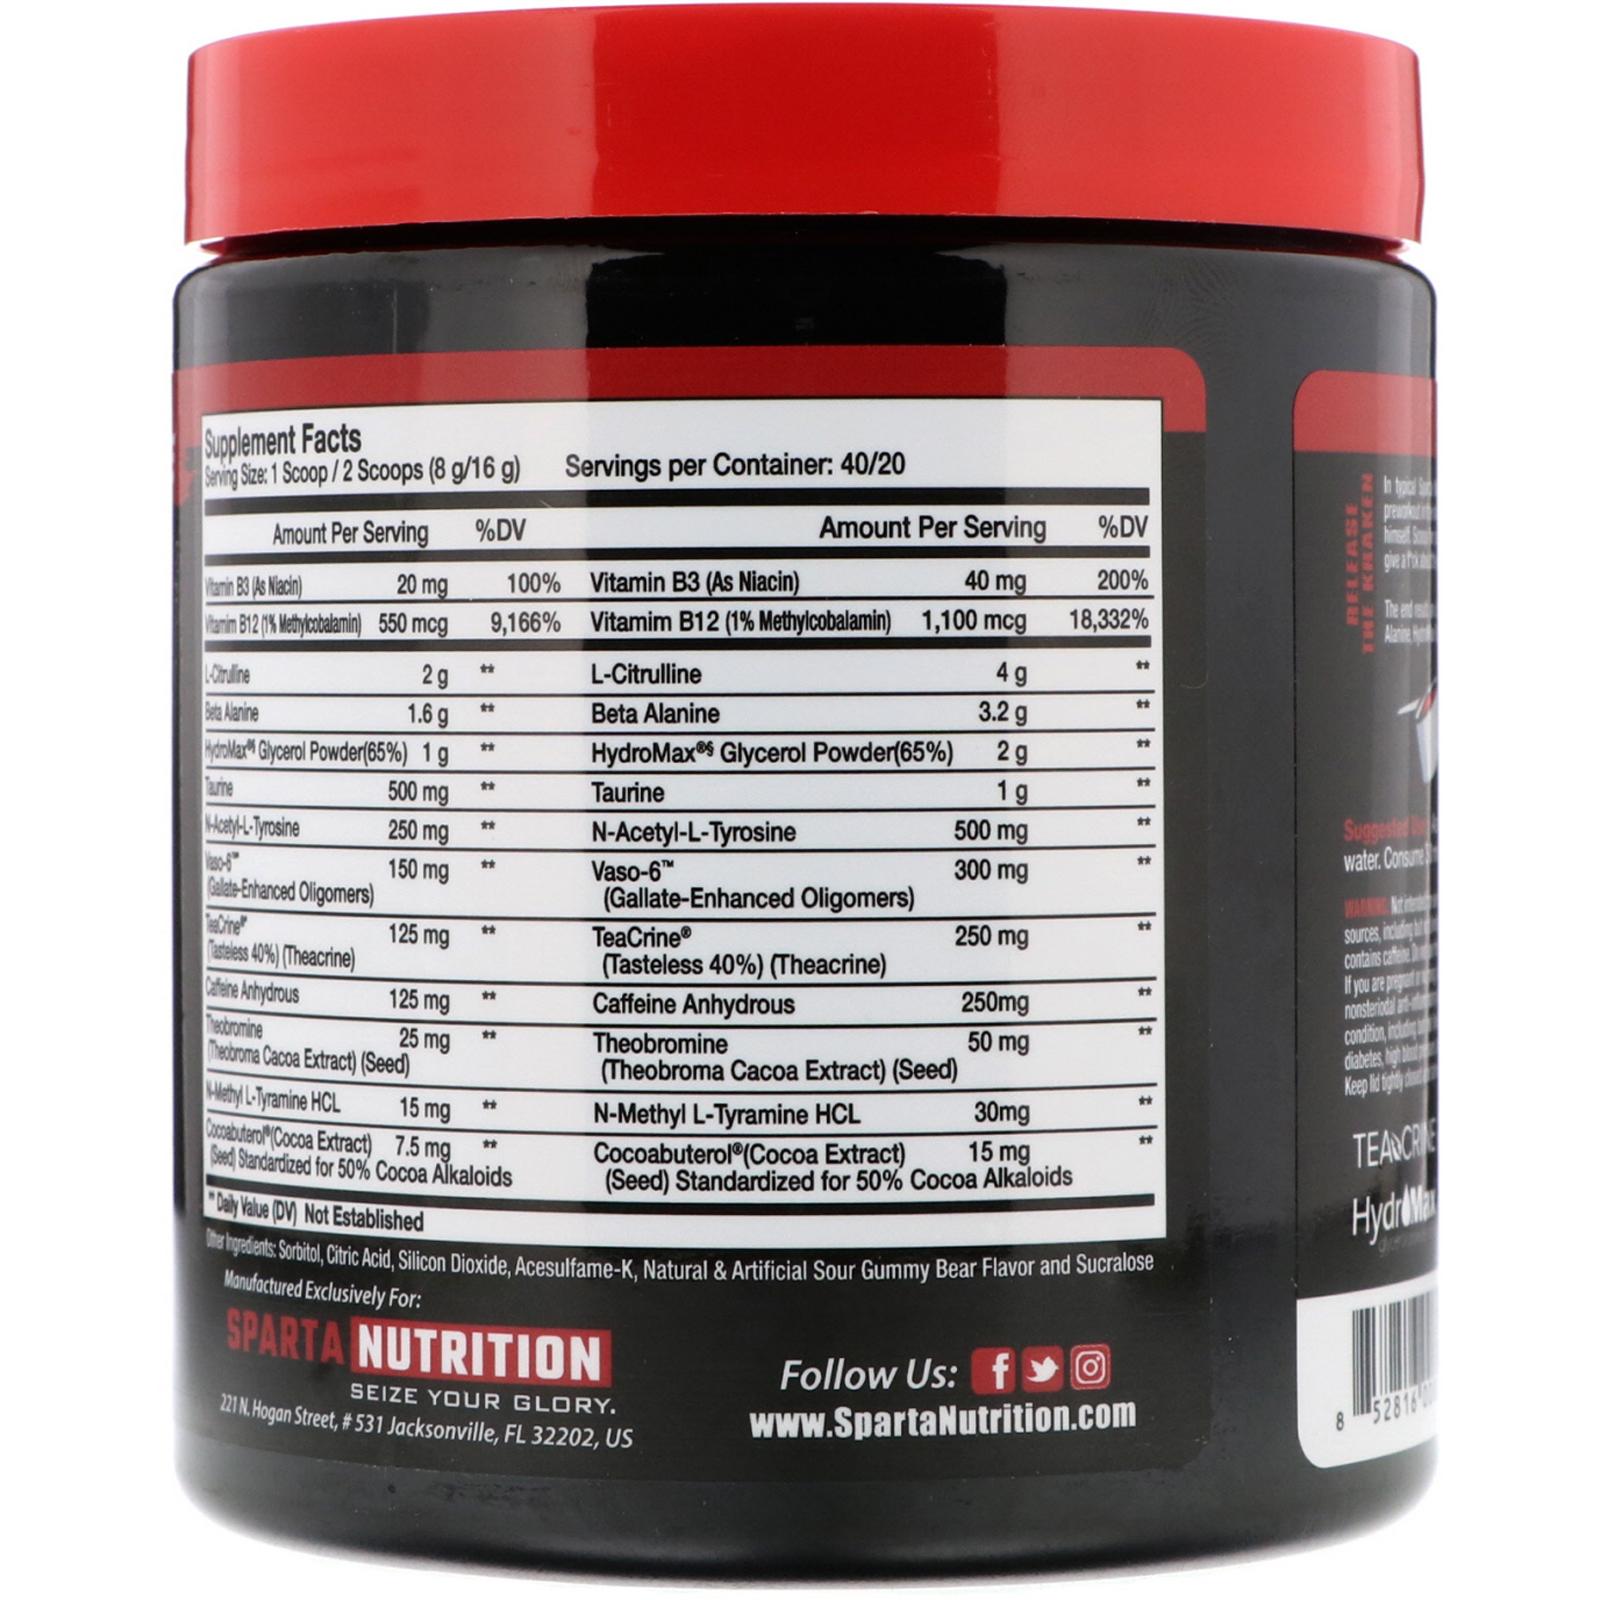 Sparta Nutrition, Kraken Extreme Pre-Workout, Sour Gummy Bear, 11 29 oz  (320 g)